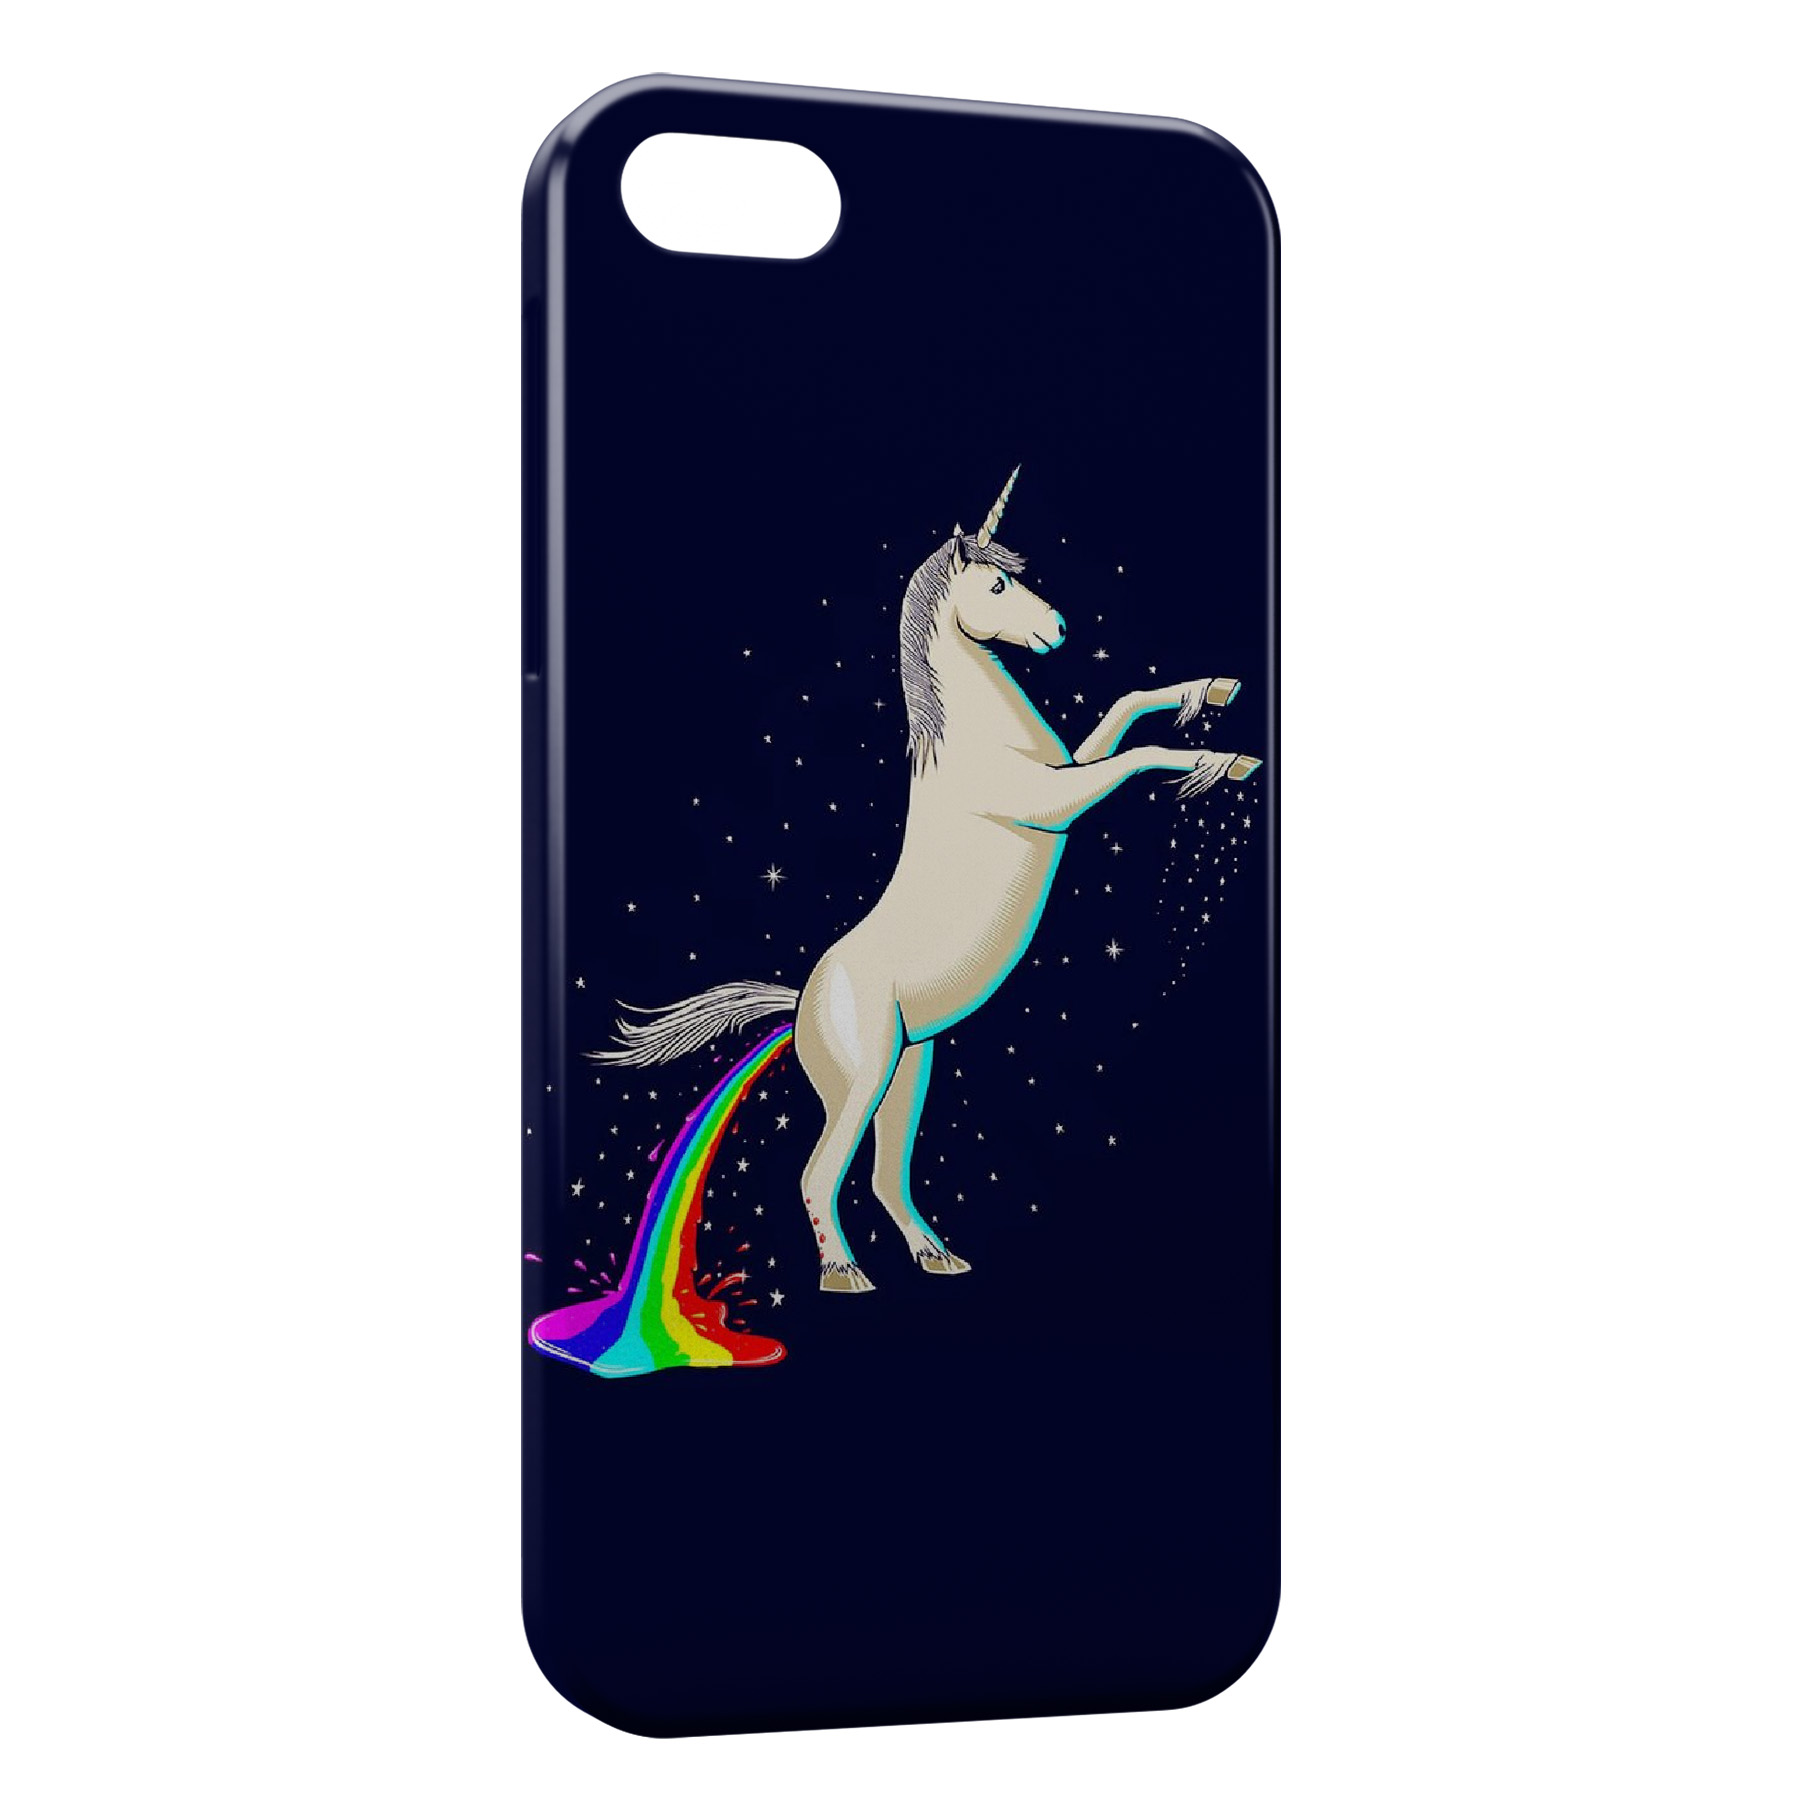 Coque iPhone 6 & 6S Uniorn Licorne Rainbow Thug